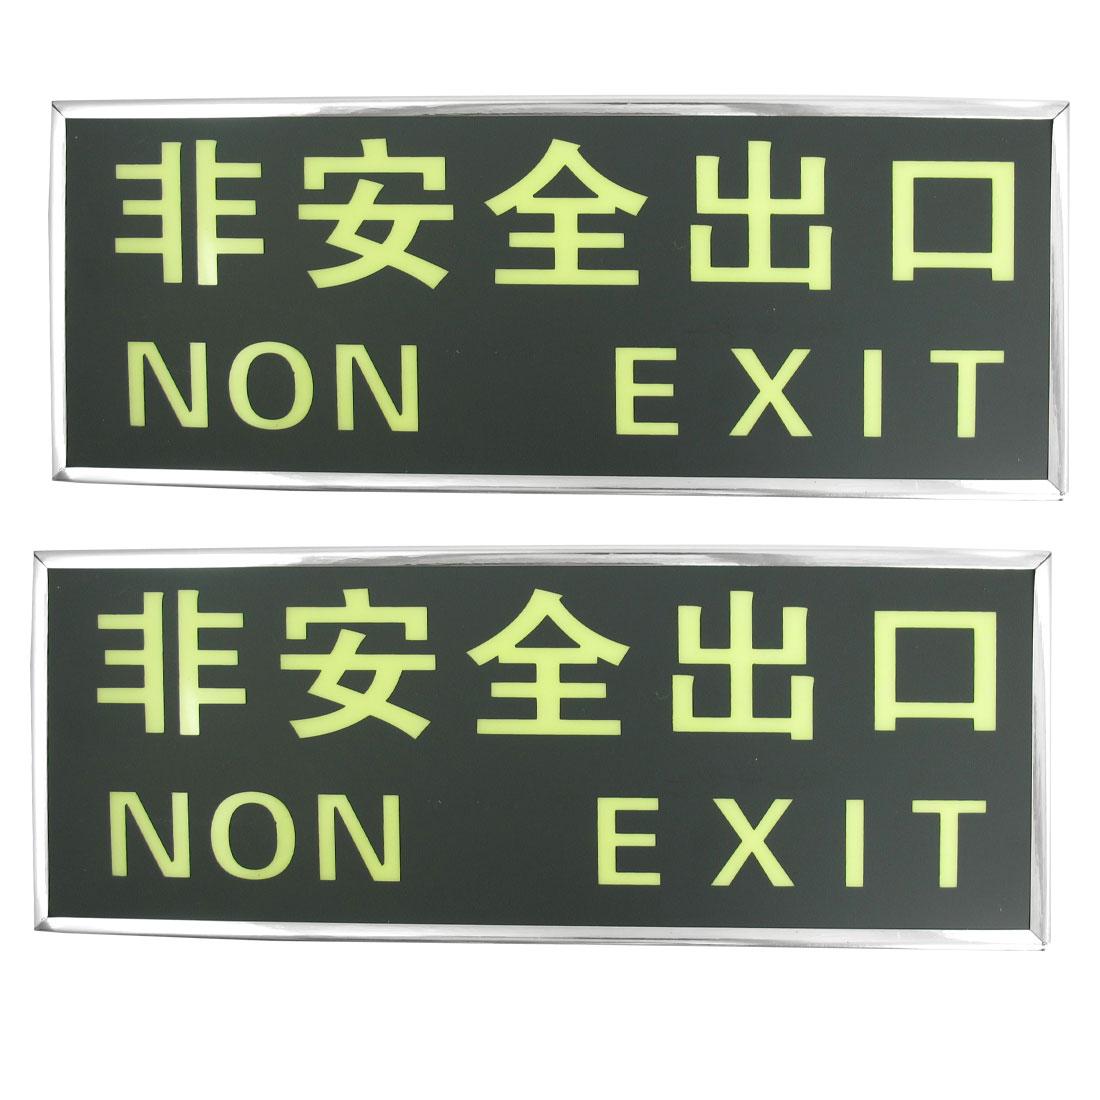 2 Pcs 335mm x 130mm Rectangle Green Plastic Luminous Non Exit Sign